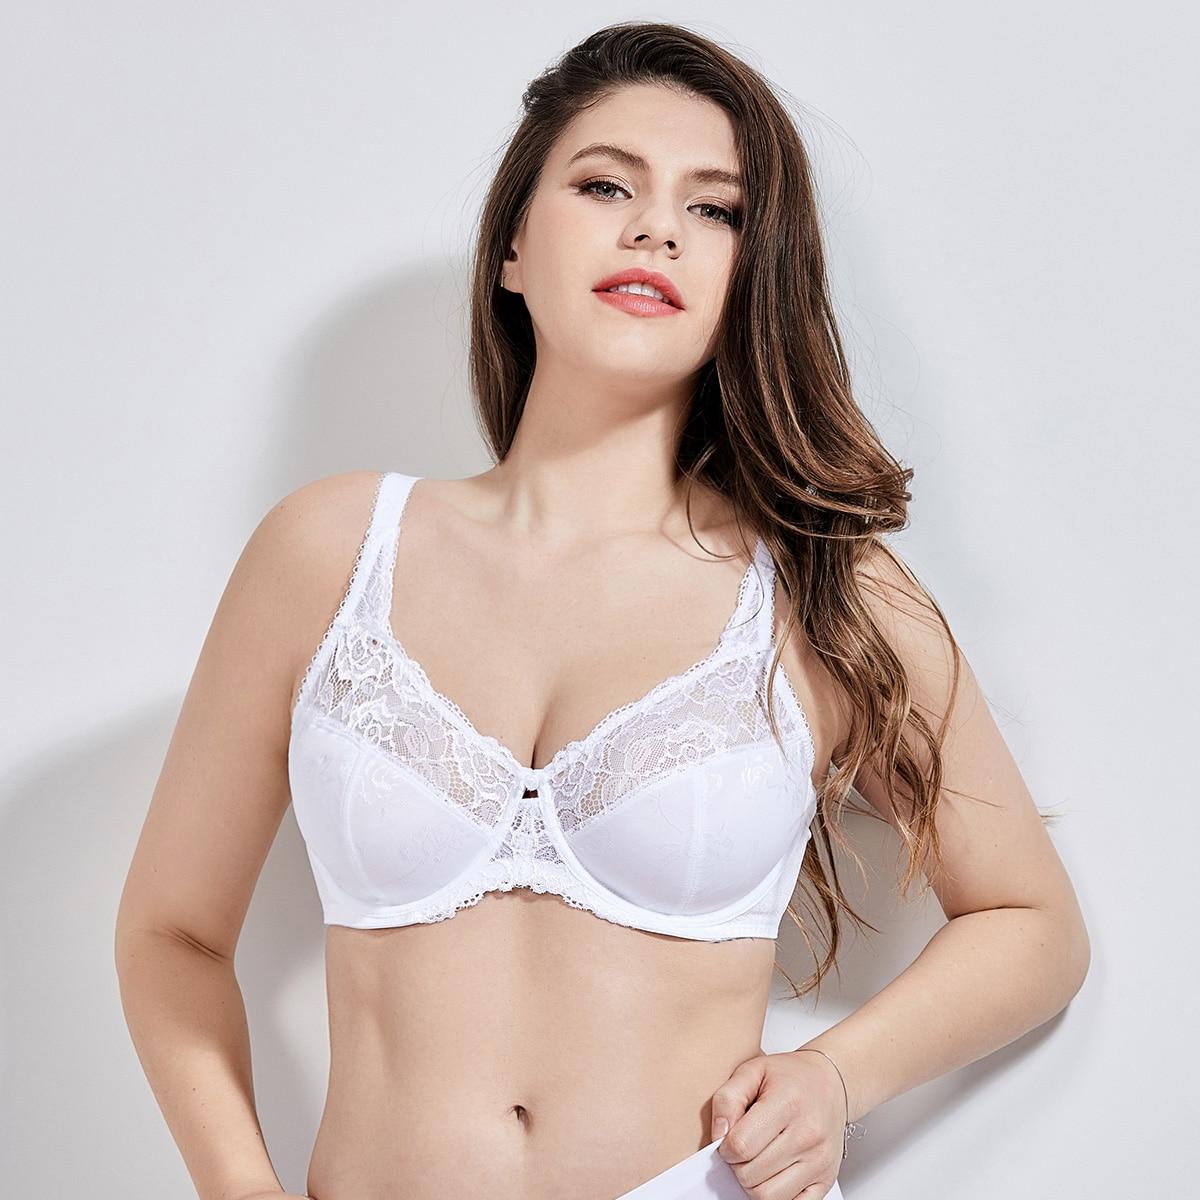 DELIMIRA Для женщин Красота кружева не мягкий Minimizer на полную фигуру, бюстгальтер на косточках - Цвет: White02